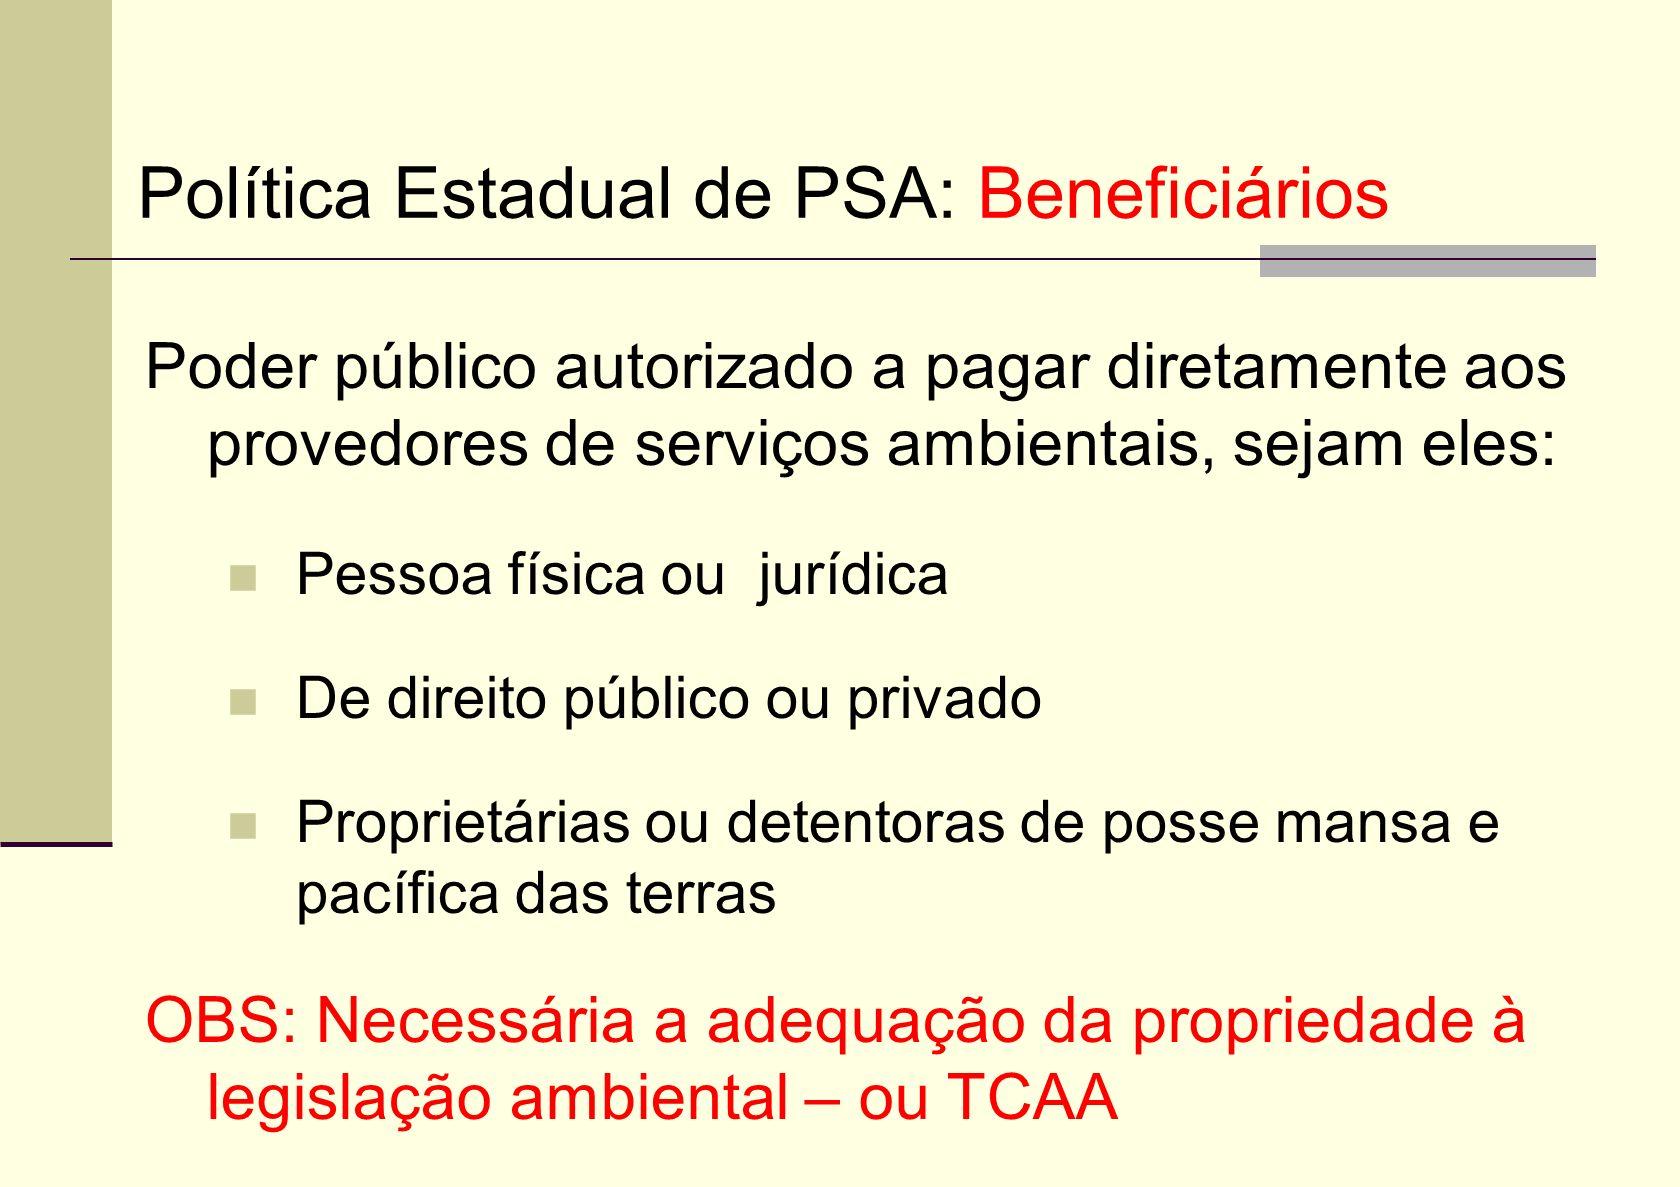 Política Estadual de PSA: Beneficiários